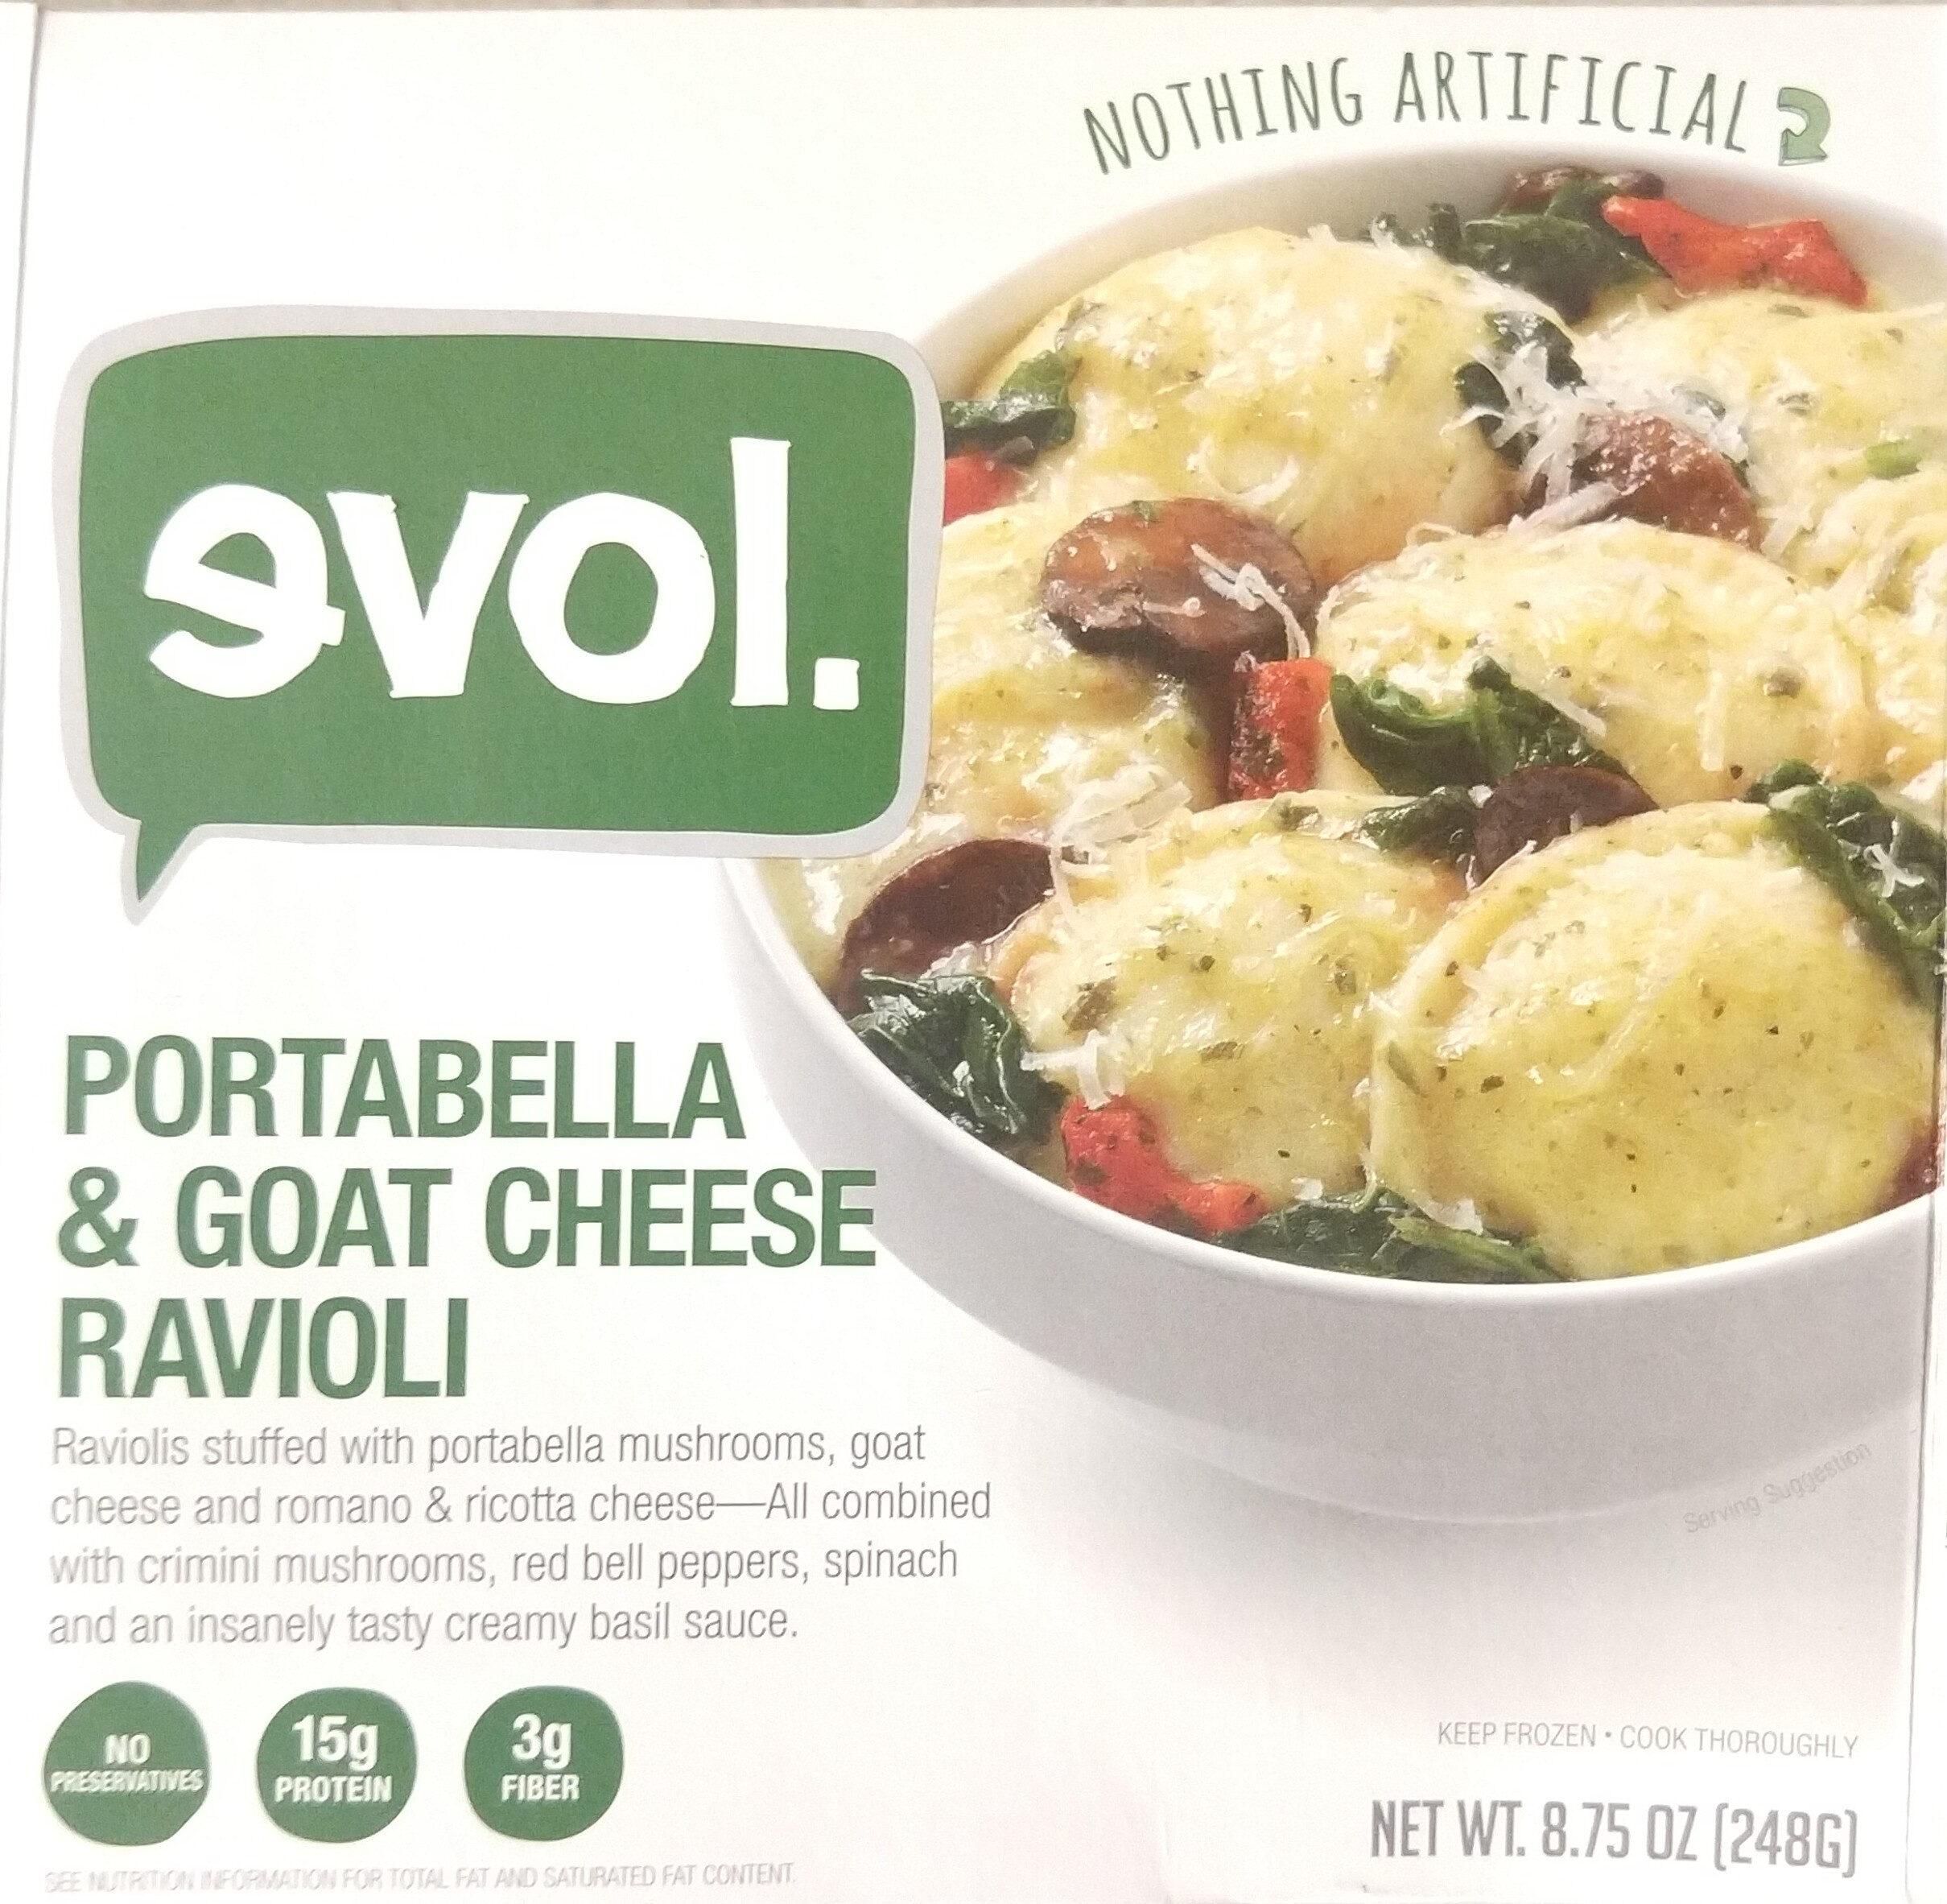 Portabella & goat cheese ravioli - Product - en